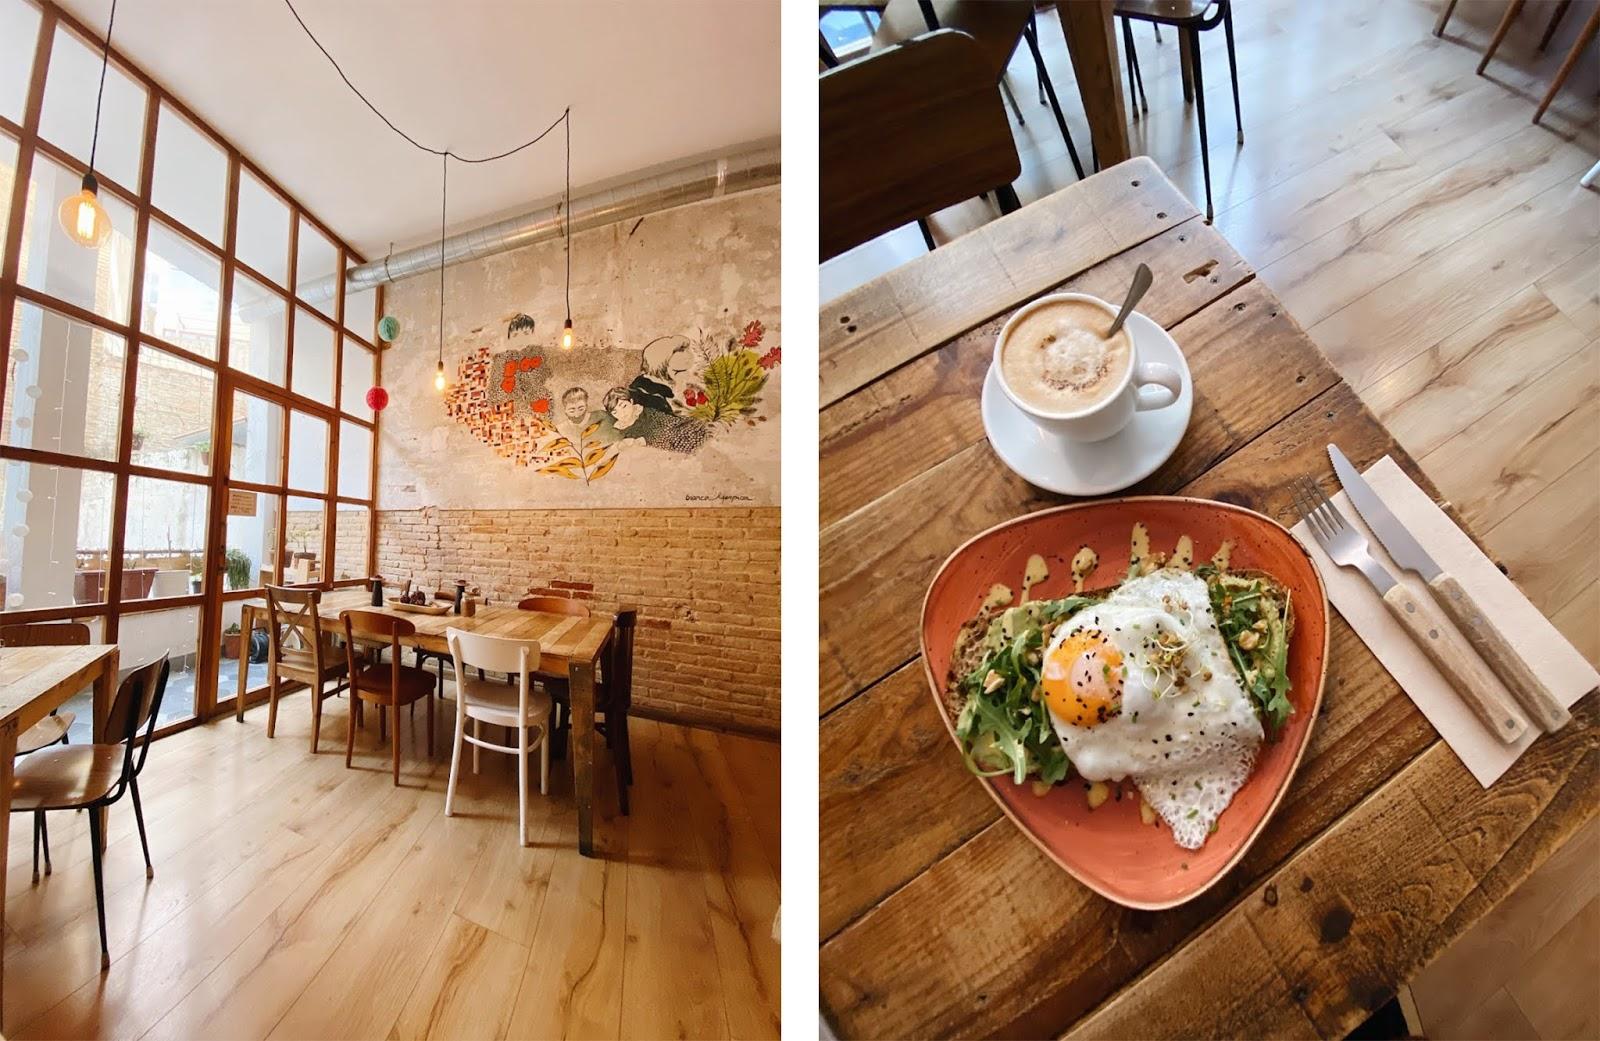 Arte Boheme, Lets get local, lets get local arte boheme, Barcelona coffee shop, cute coffe shop barcelona, Barcelona Shop, Barcelona coffee.Juice House, Juice House Barcelona